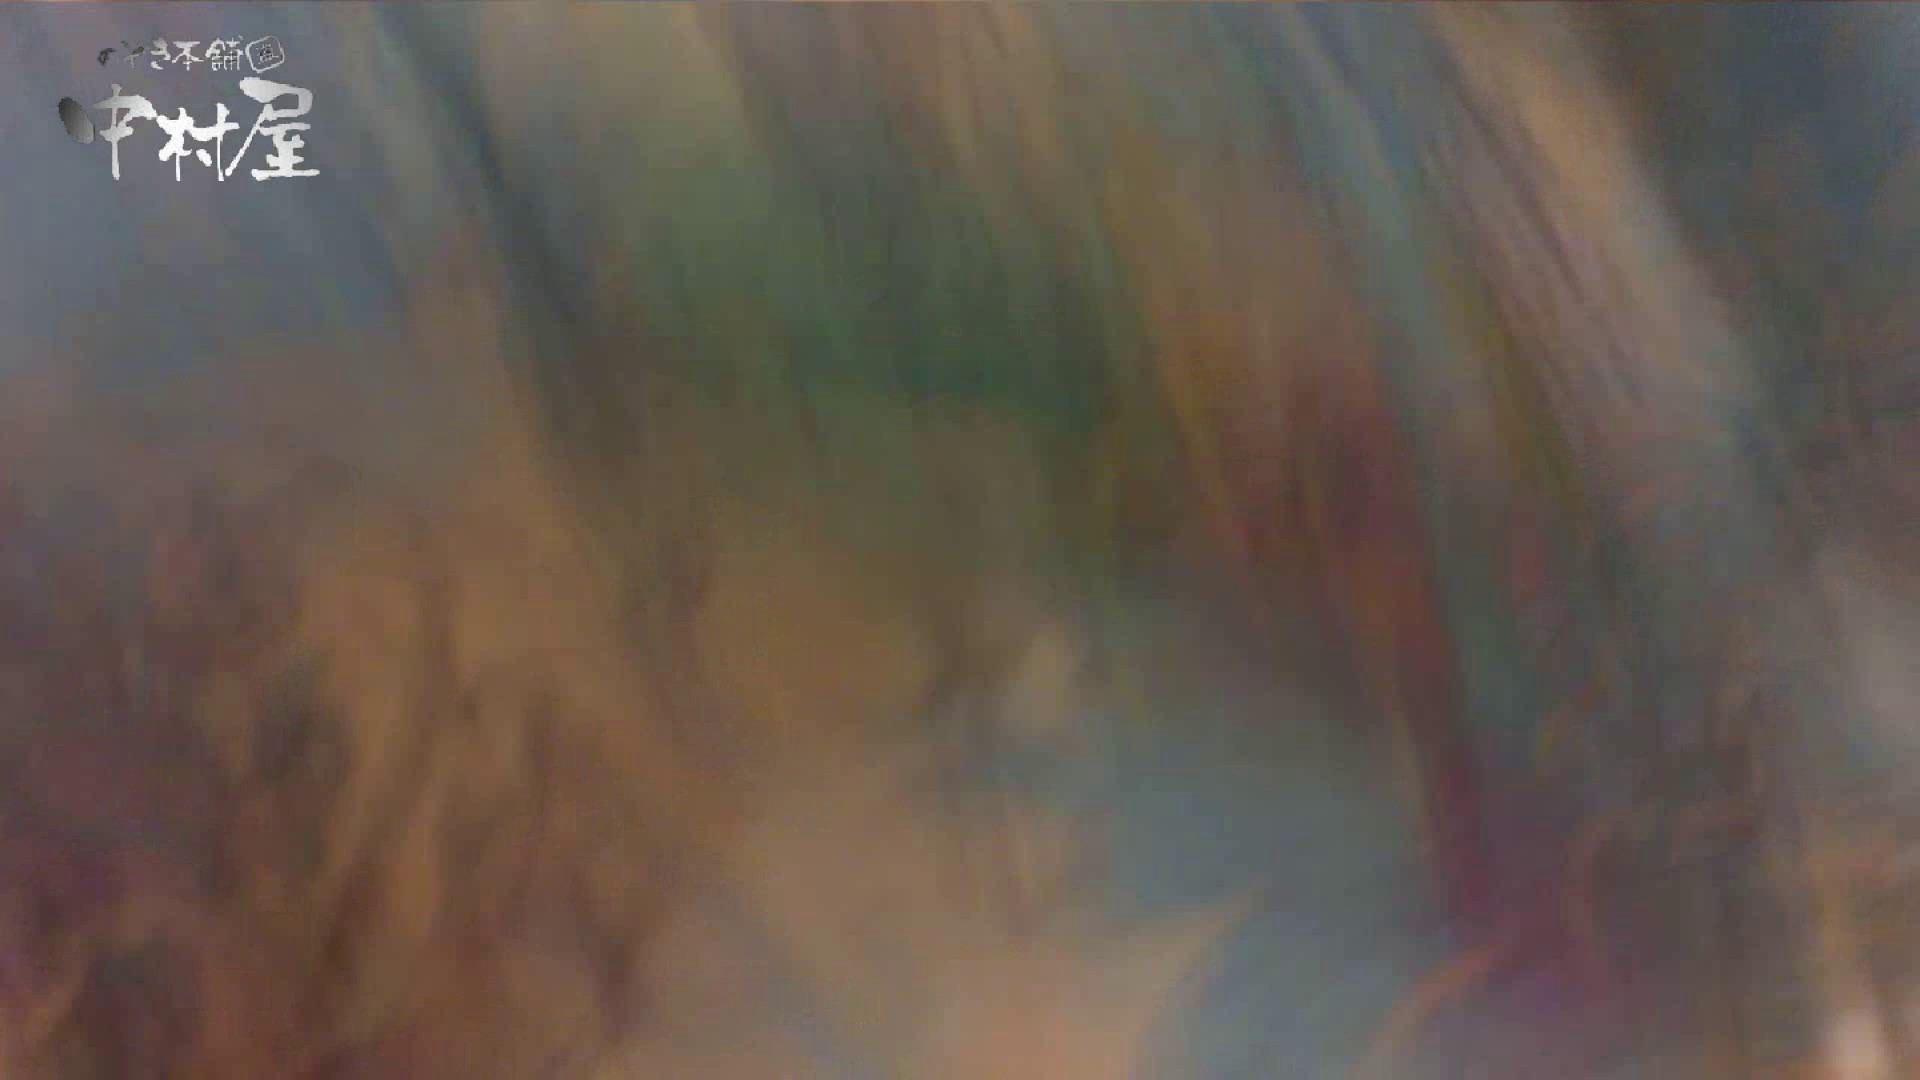 vol.43 可愛いカリスマ店員限定‼胸チラ&パンチラ 美脚おねーさんの胸元ゲット! パンチラ | HなOL  83pic 49